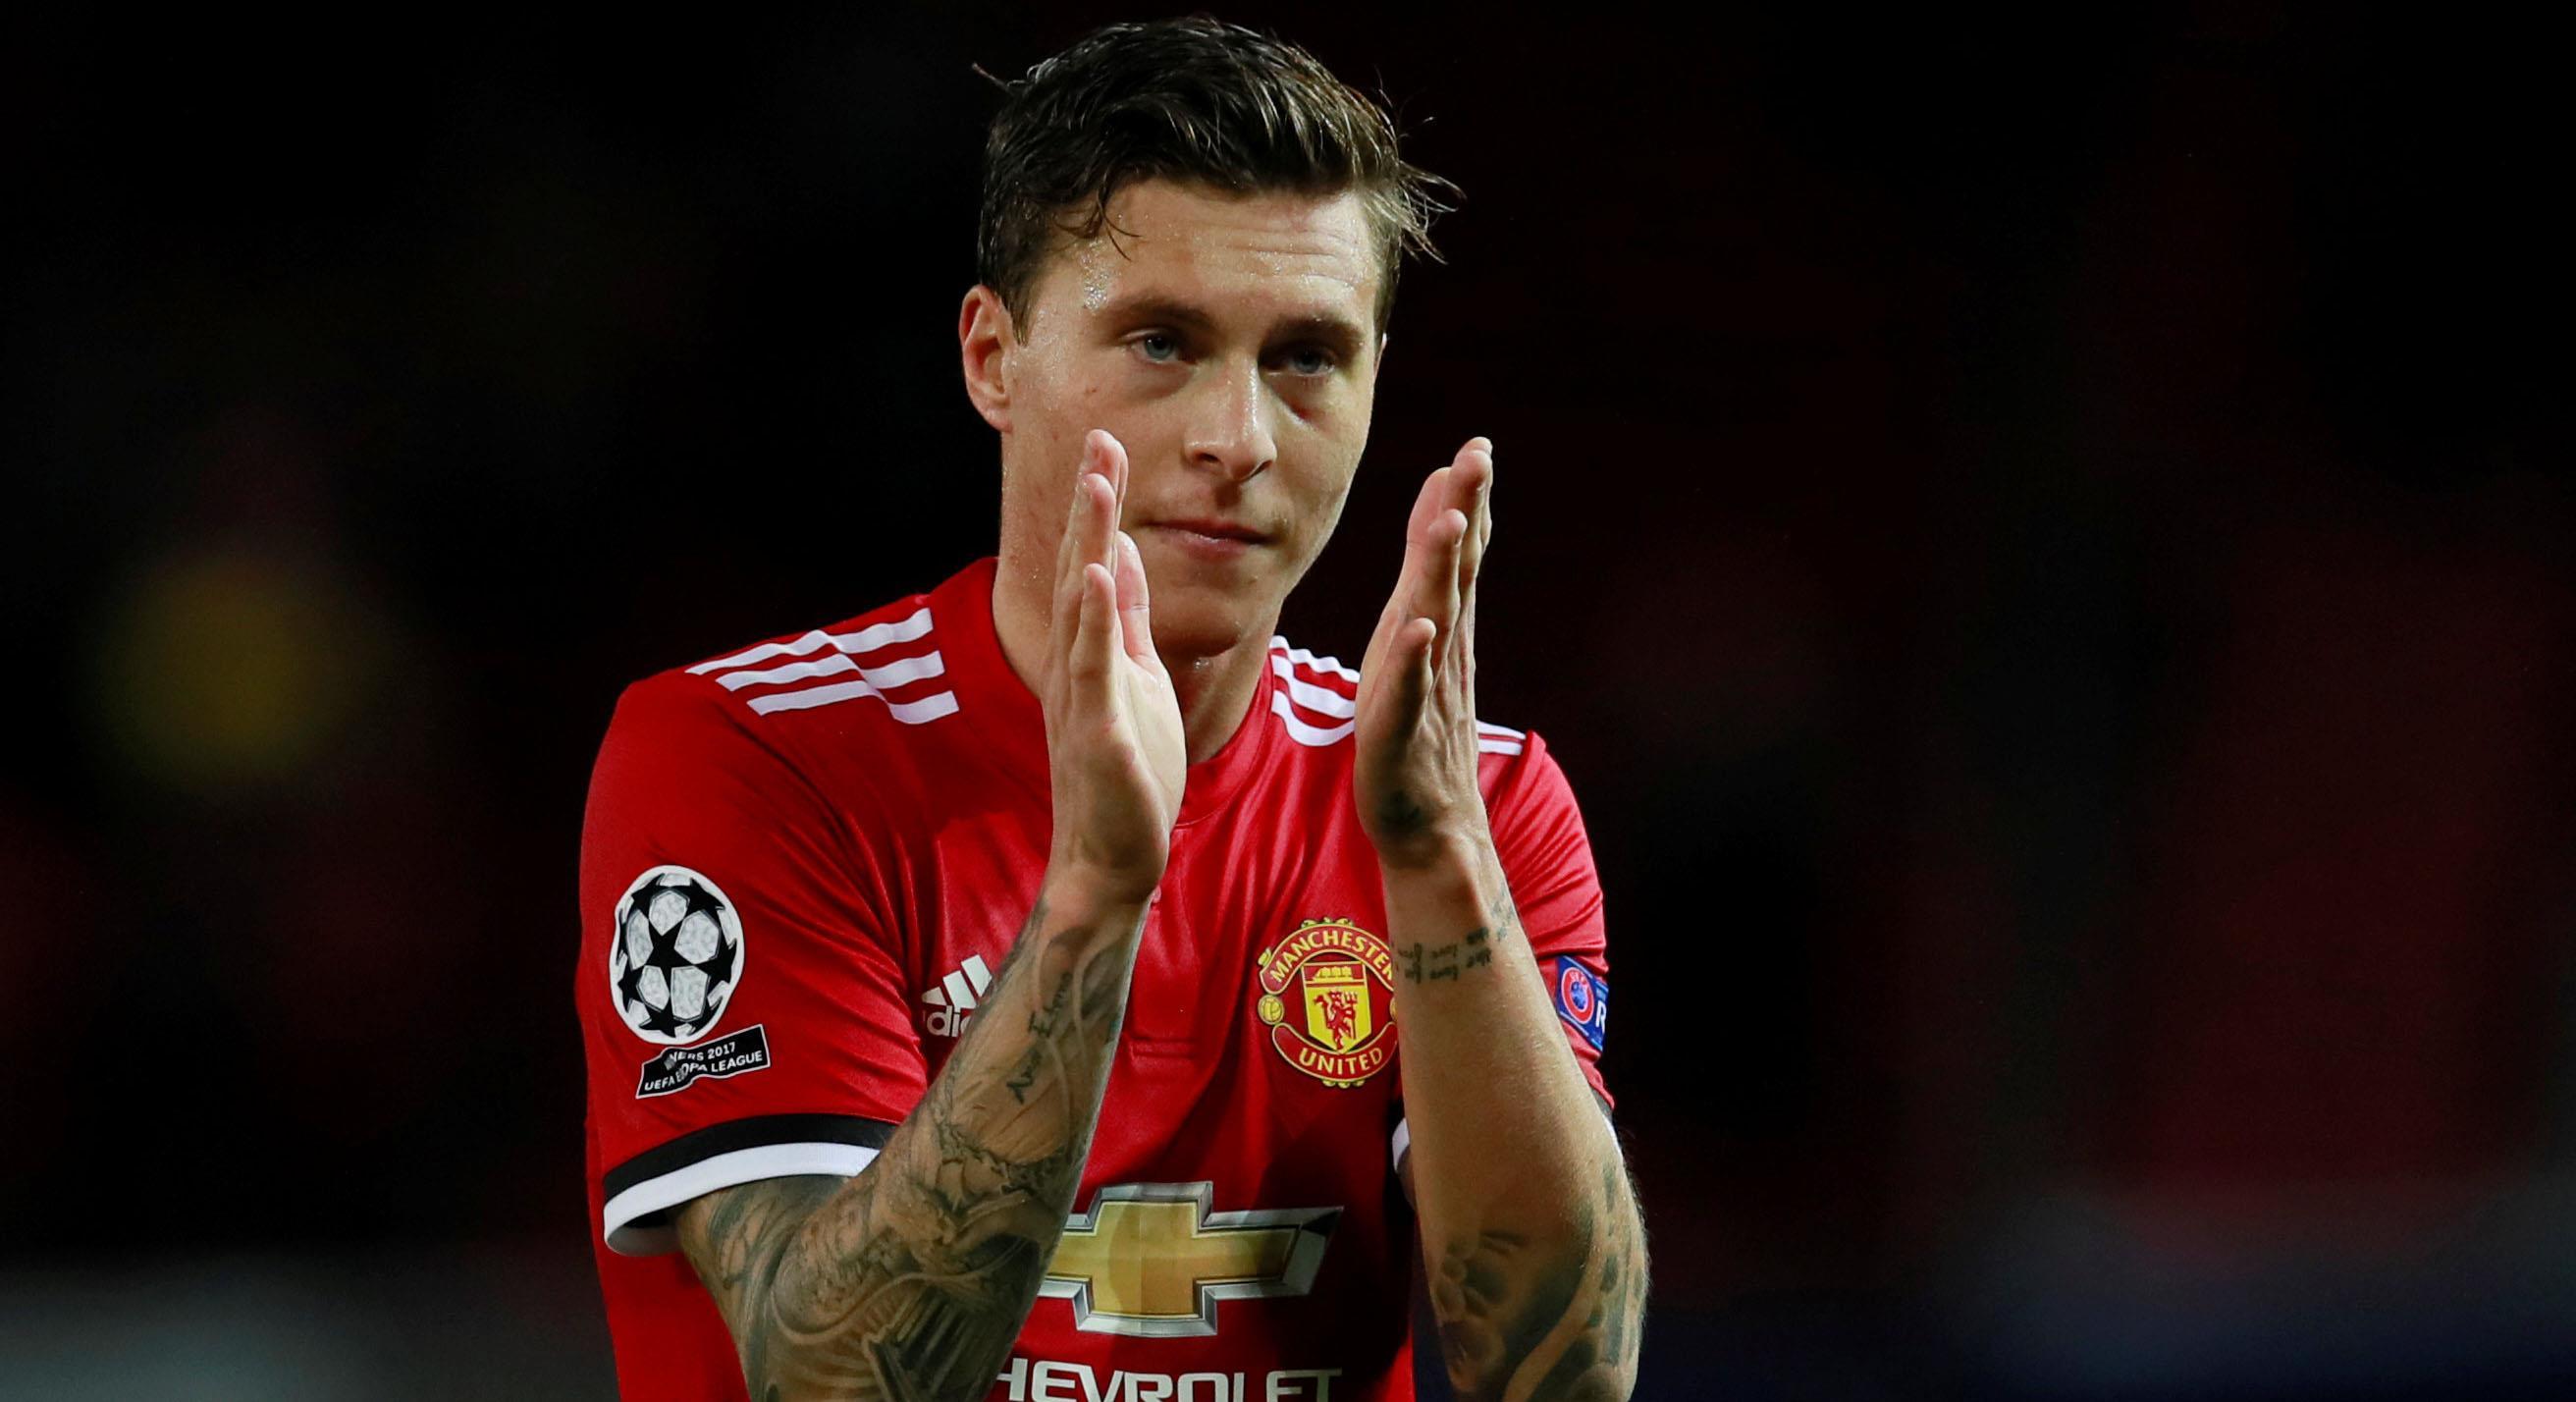 Uniteds positiva besked inför Europamatchen - Lindelöf uppges starta